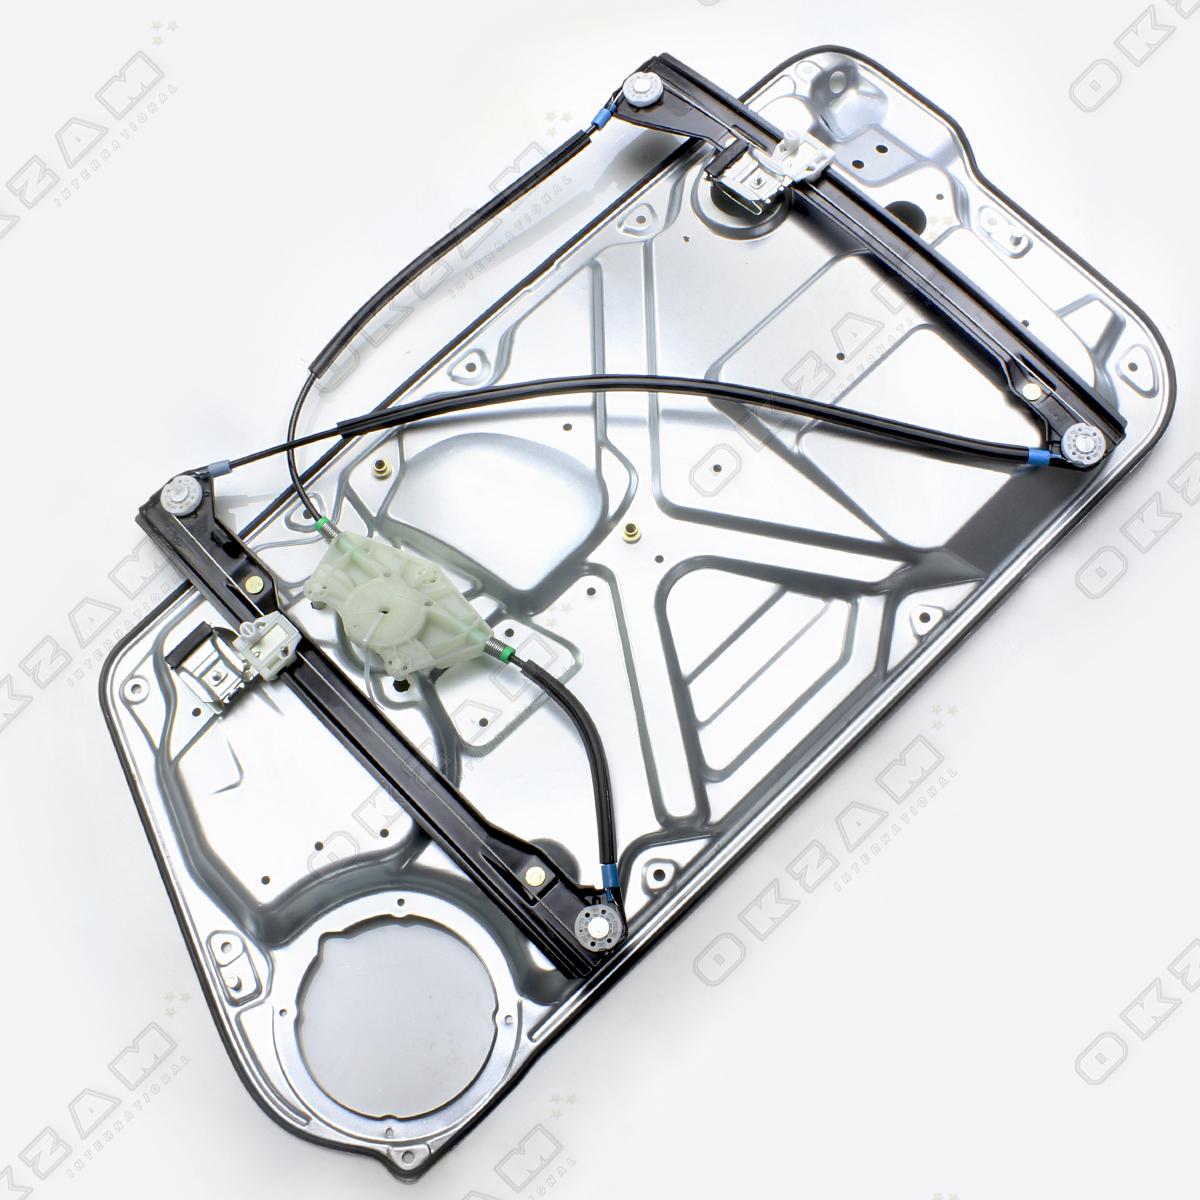 Window regulator complete metal plate 1c0837655 front left for 2000 vw beetle power window switch